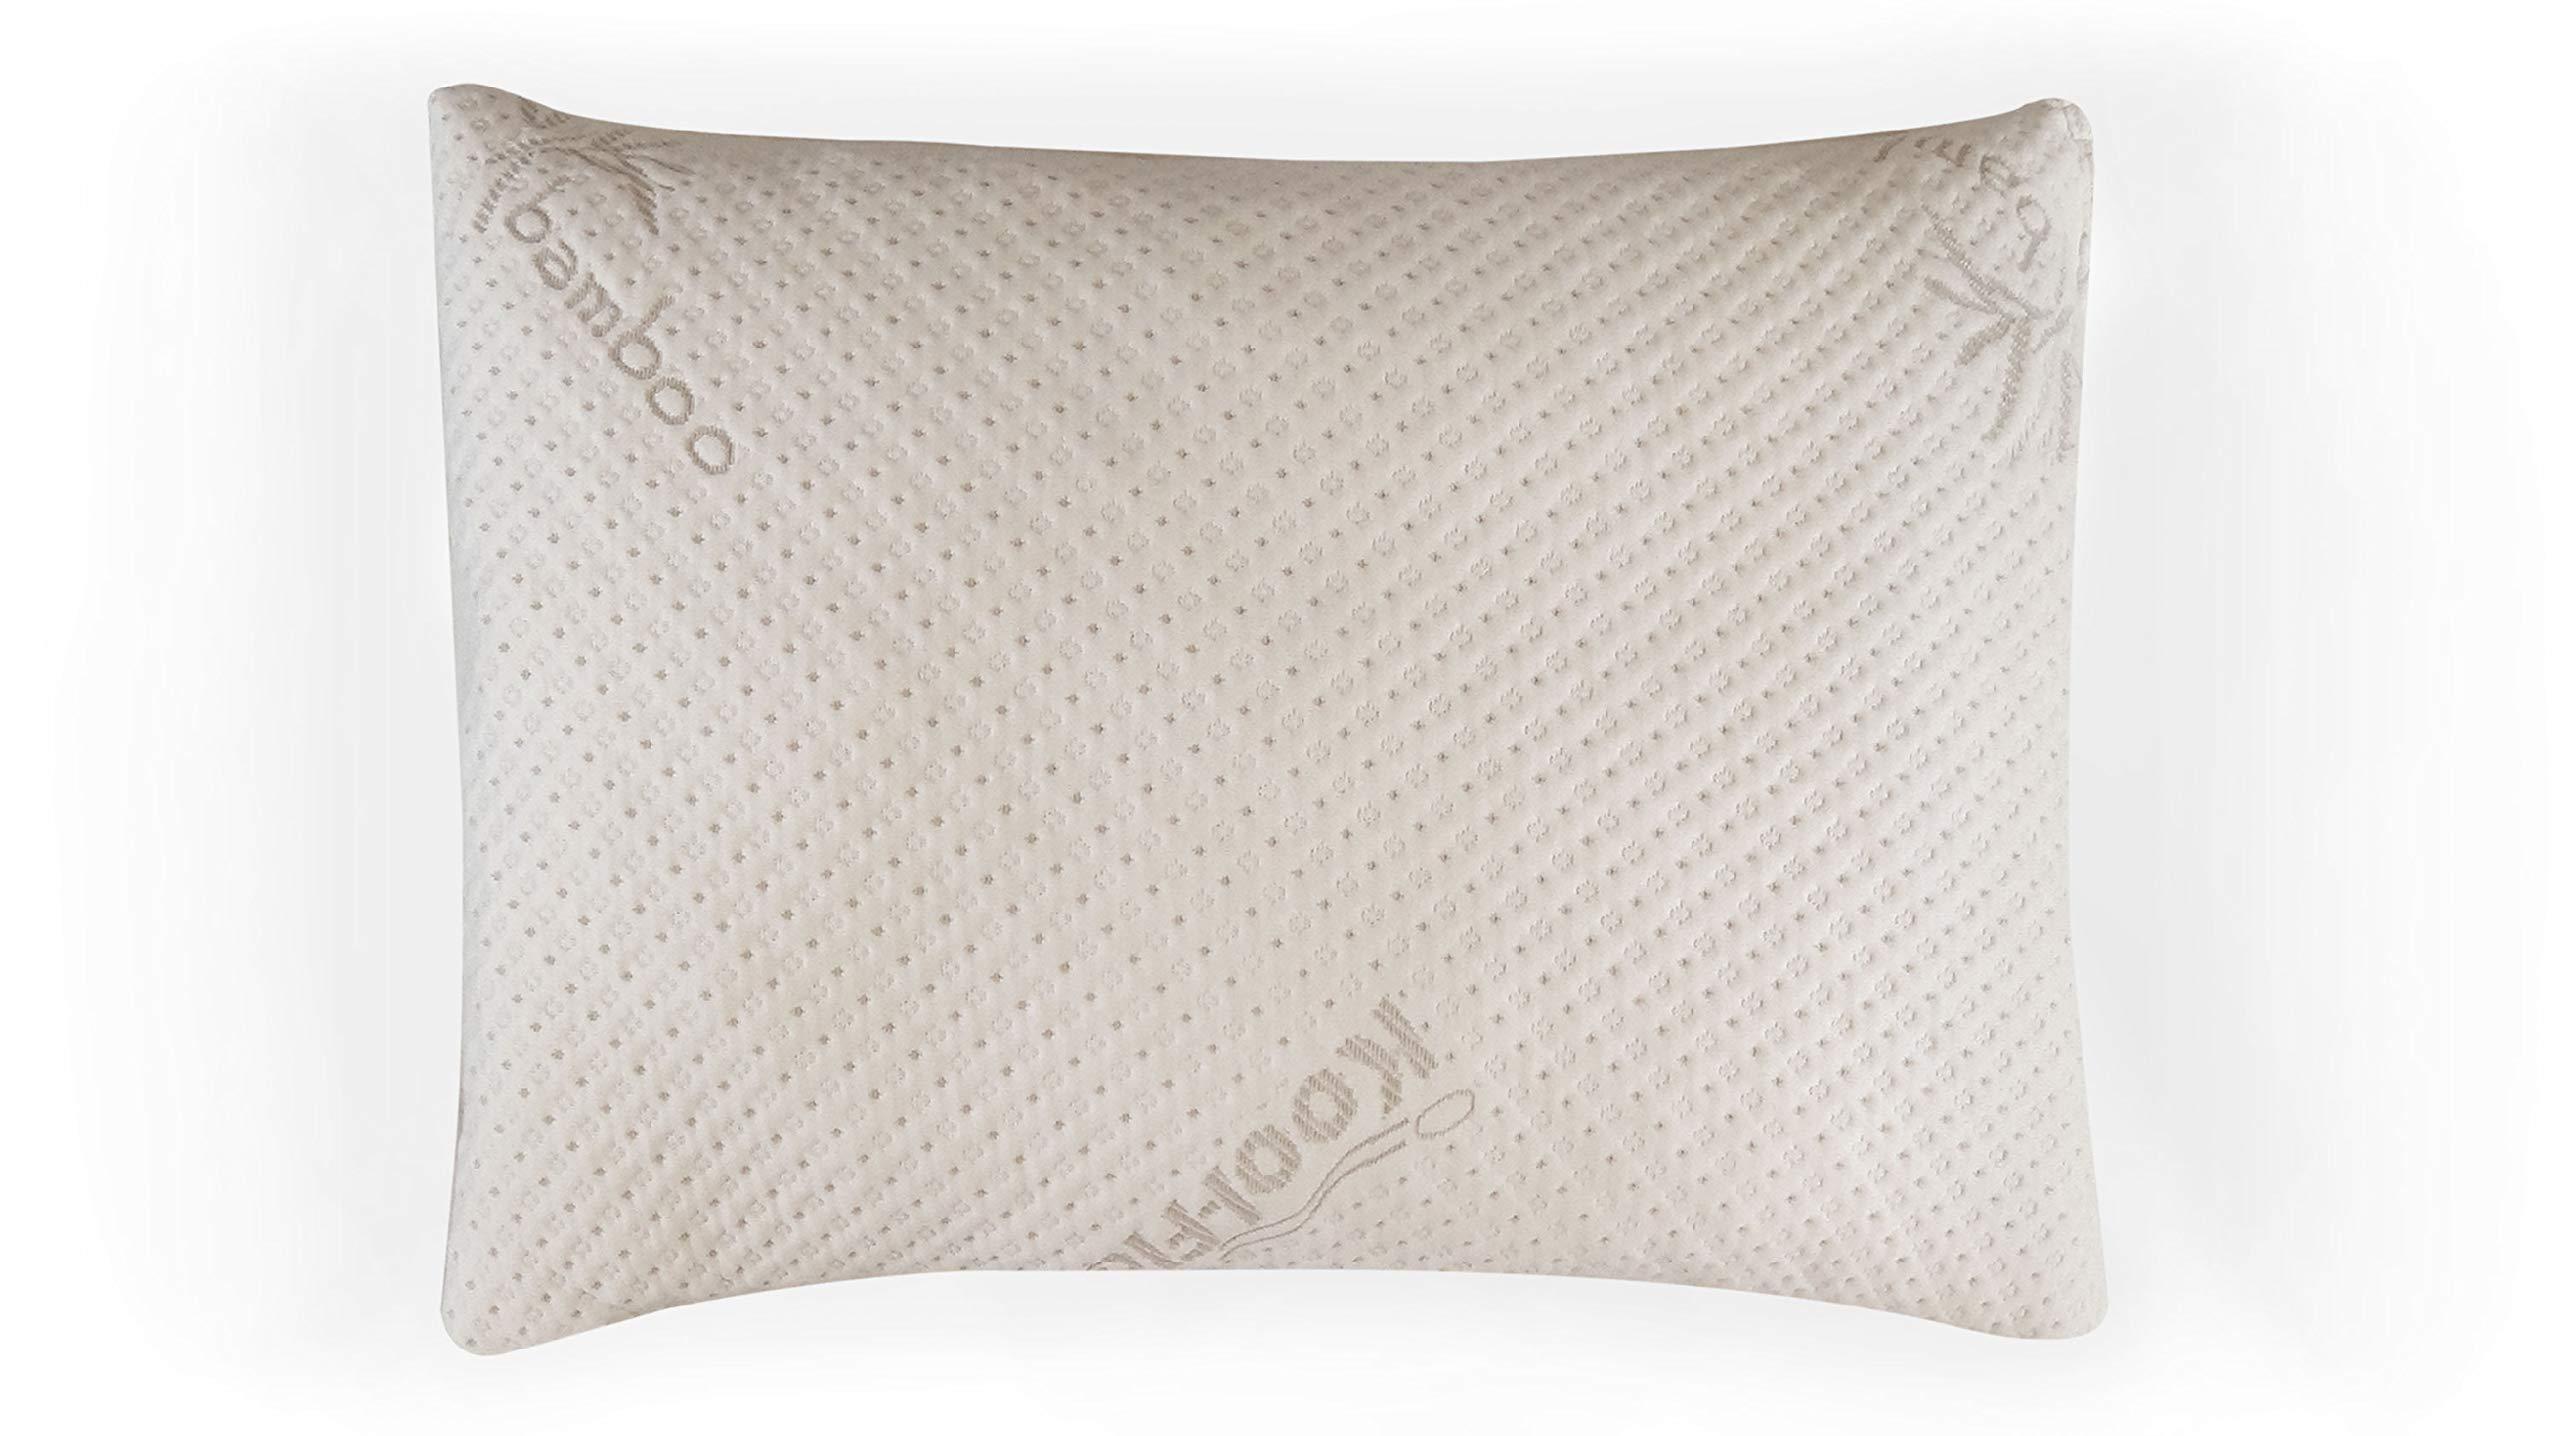 Snuggle Pedic Ultra Luxury Combination Adjustable Hypoallergenic